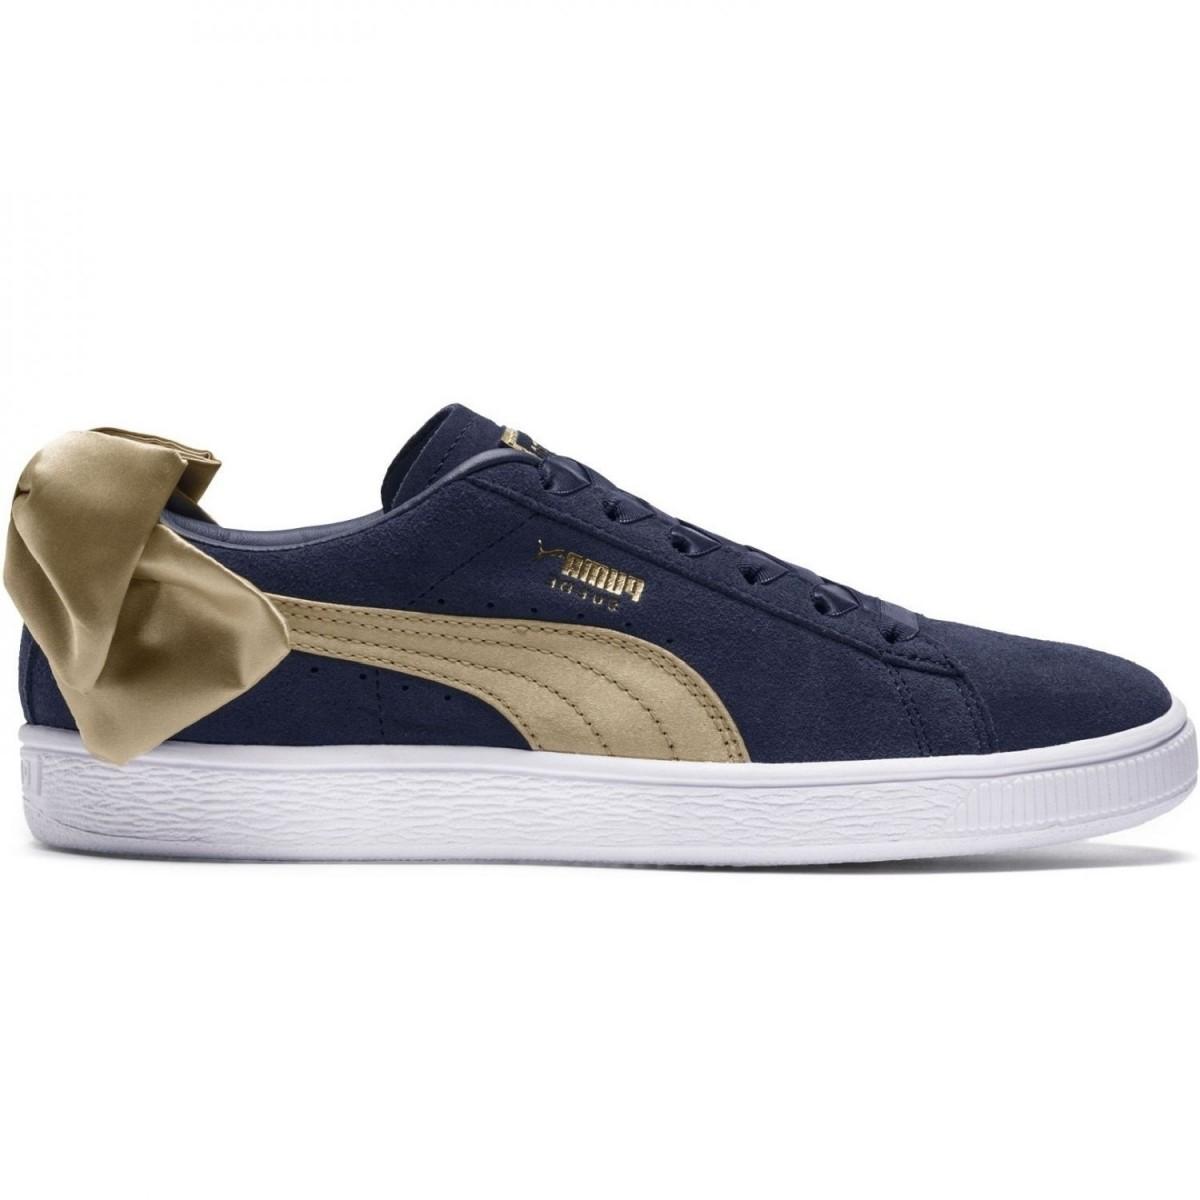 Puma Suede Bow Varsity Sneaker